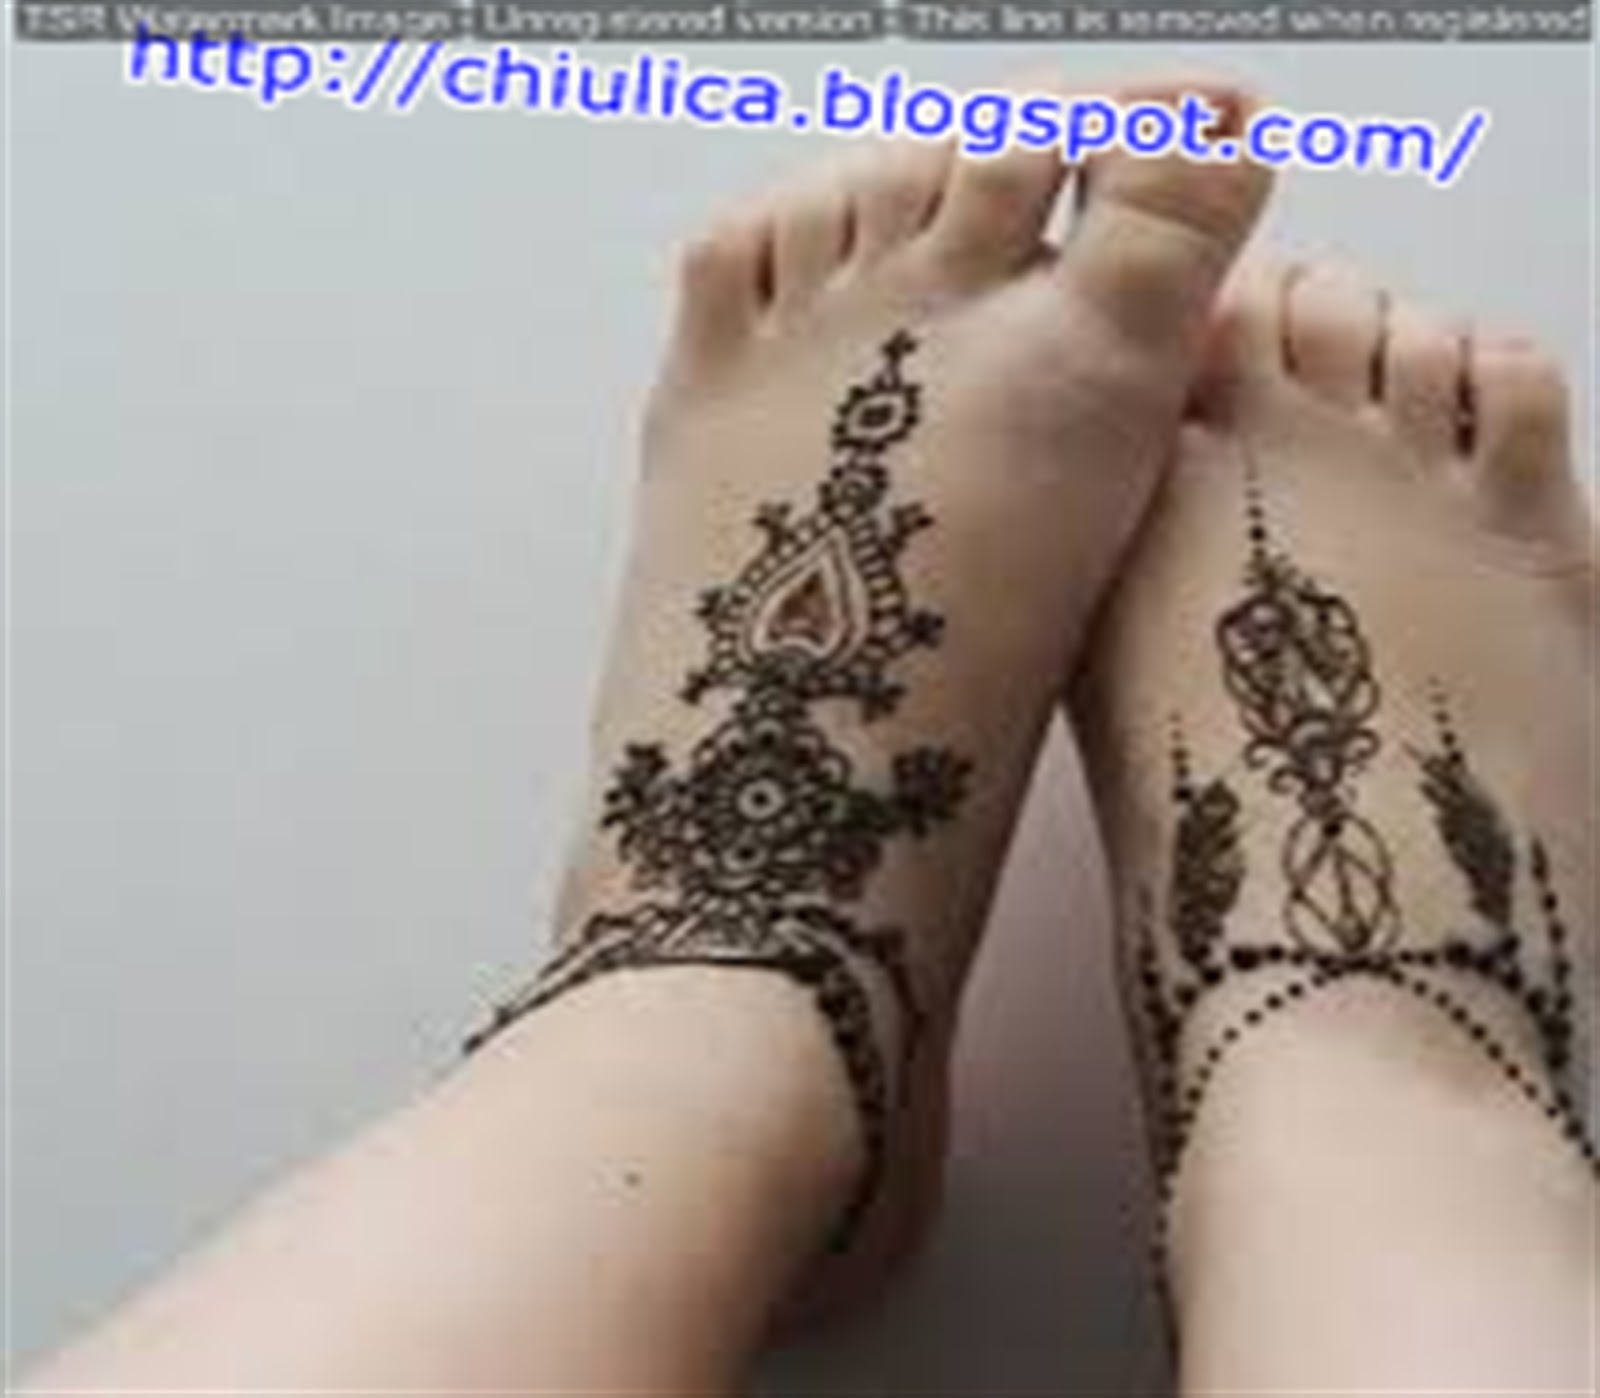 Pacar Henna Simple Terbaru 2017 Teknik Menggambar Henna Atau Inai